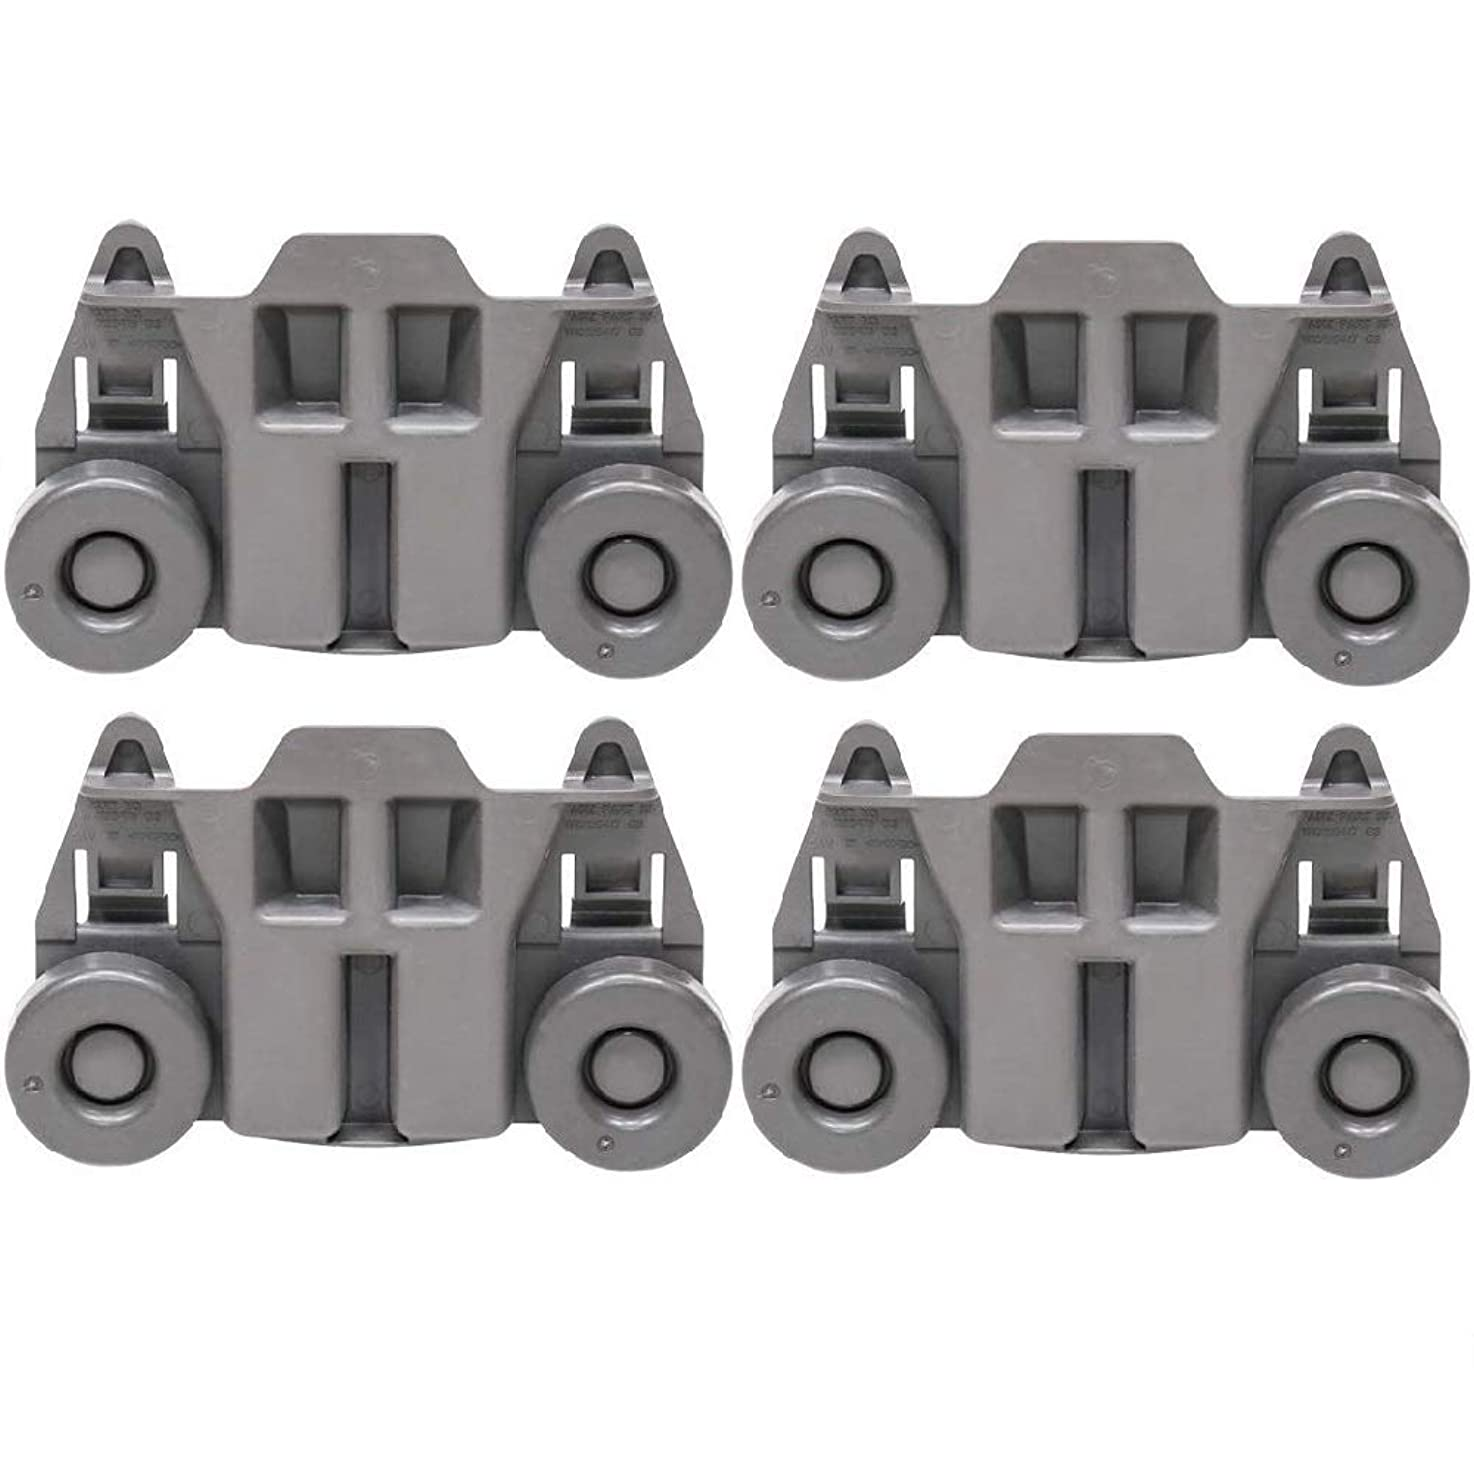 Odowalker Pack of 4 Dishwasher Premium Wheels Lower Rack for Kenmore Elite Dishwasher Parts W10195417 Kitchen Aid Dishwasher caqpmeoxsfvfc7